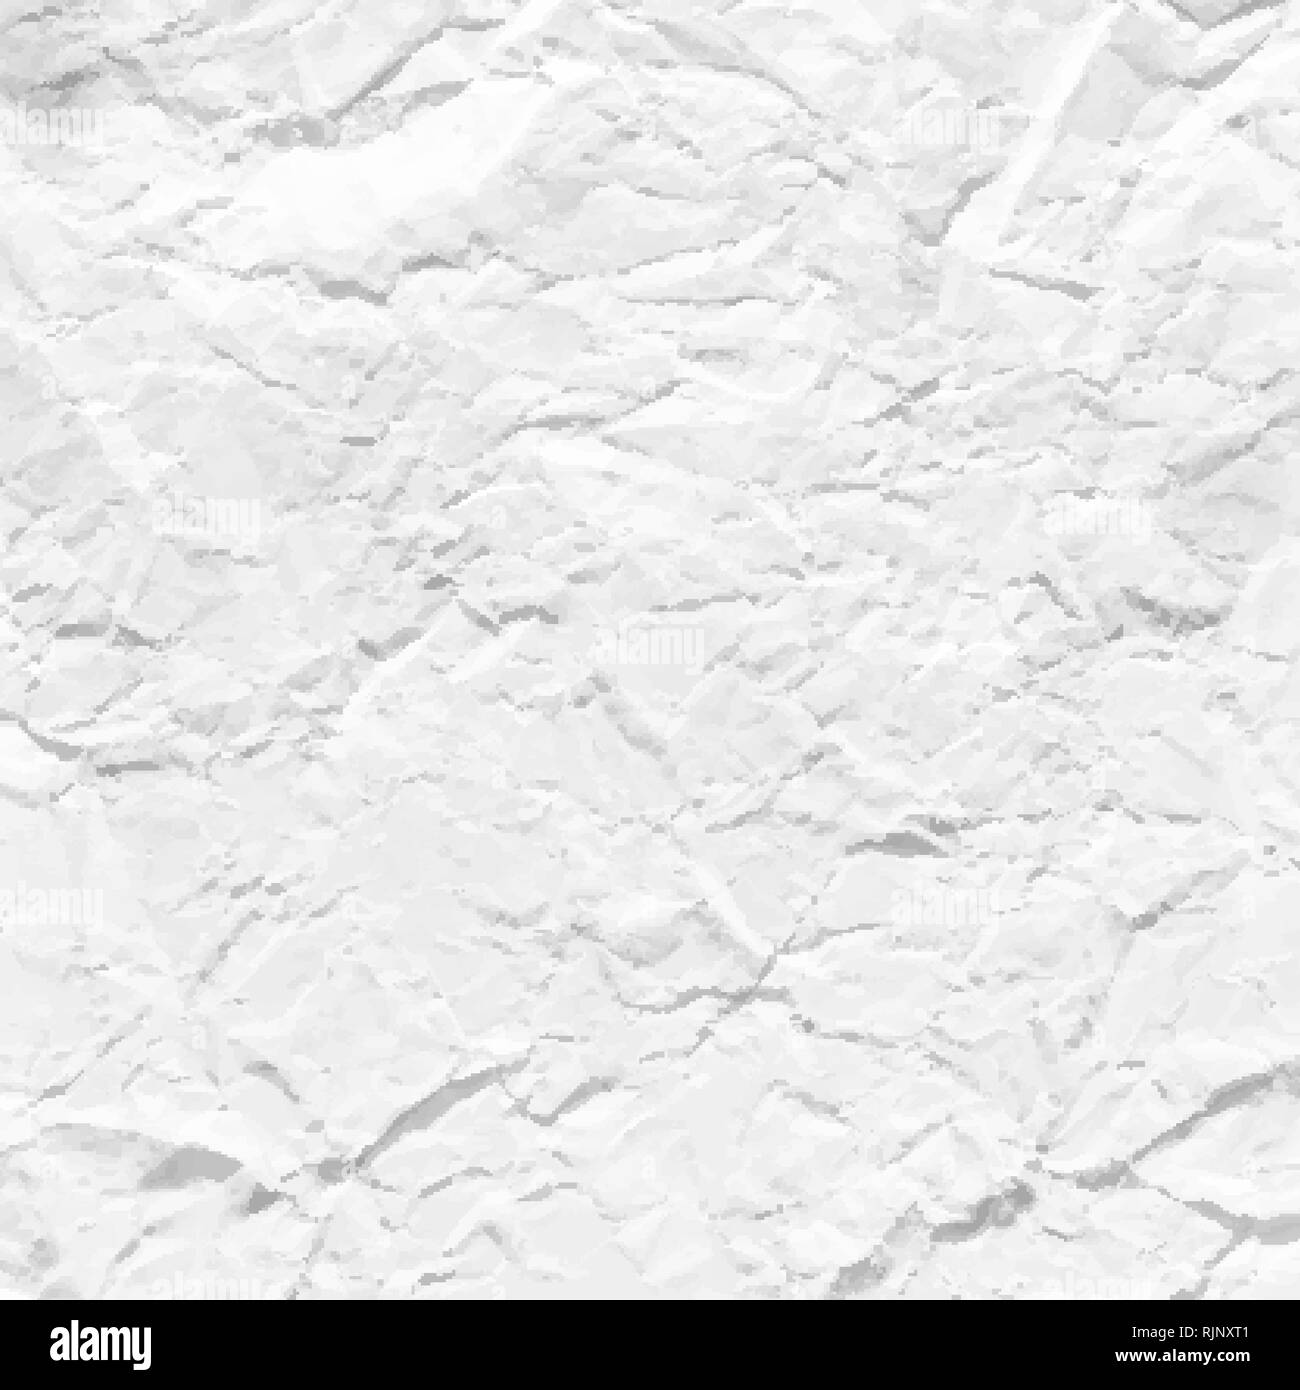 crumpled paper texture vector - Stock Image